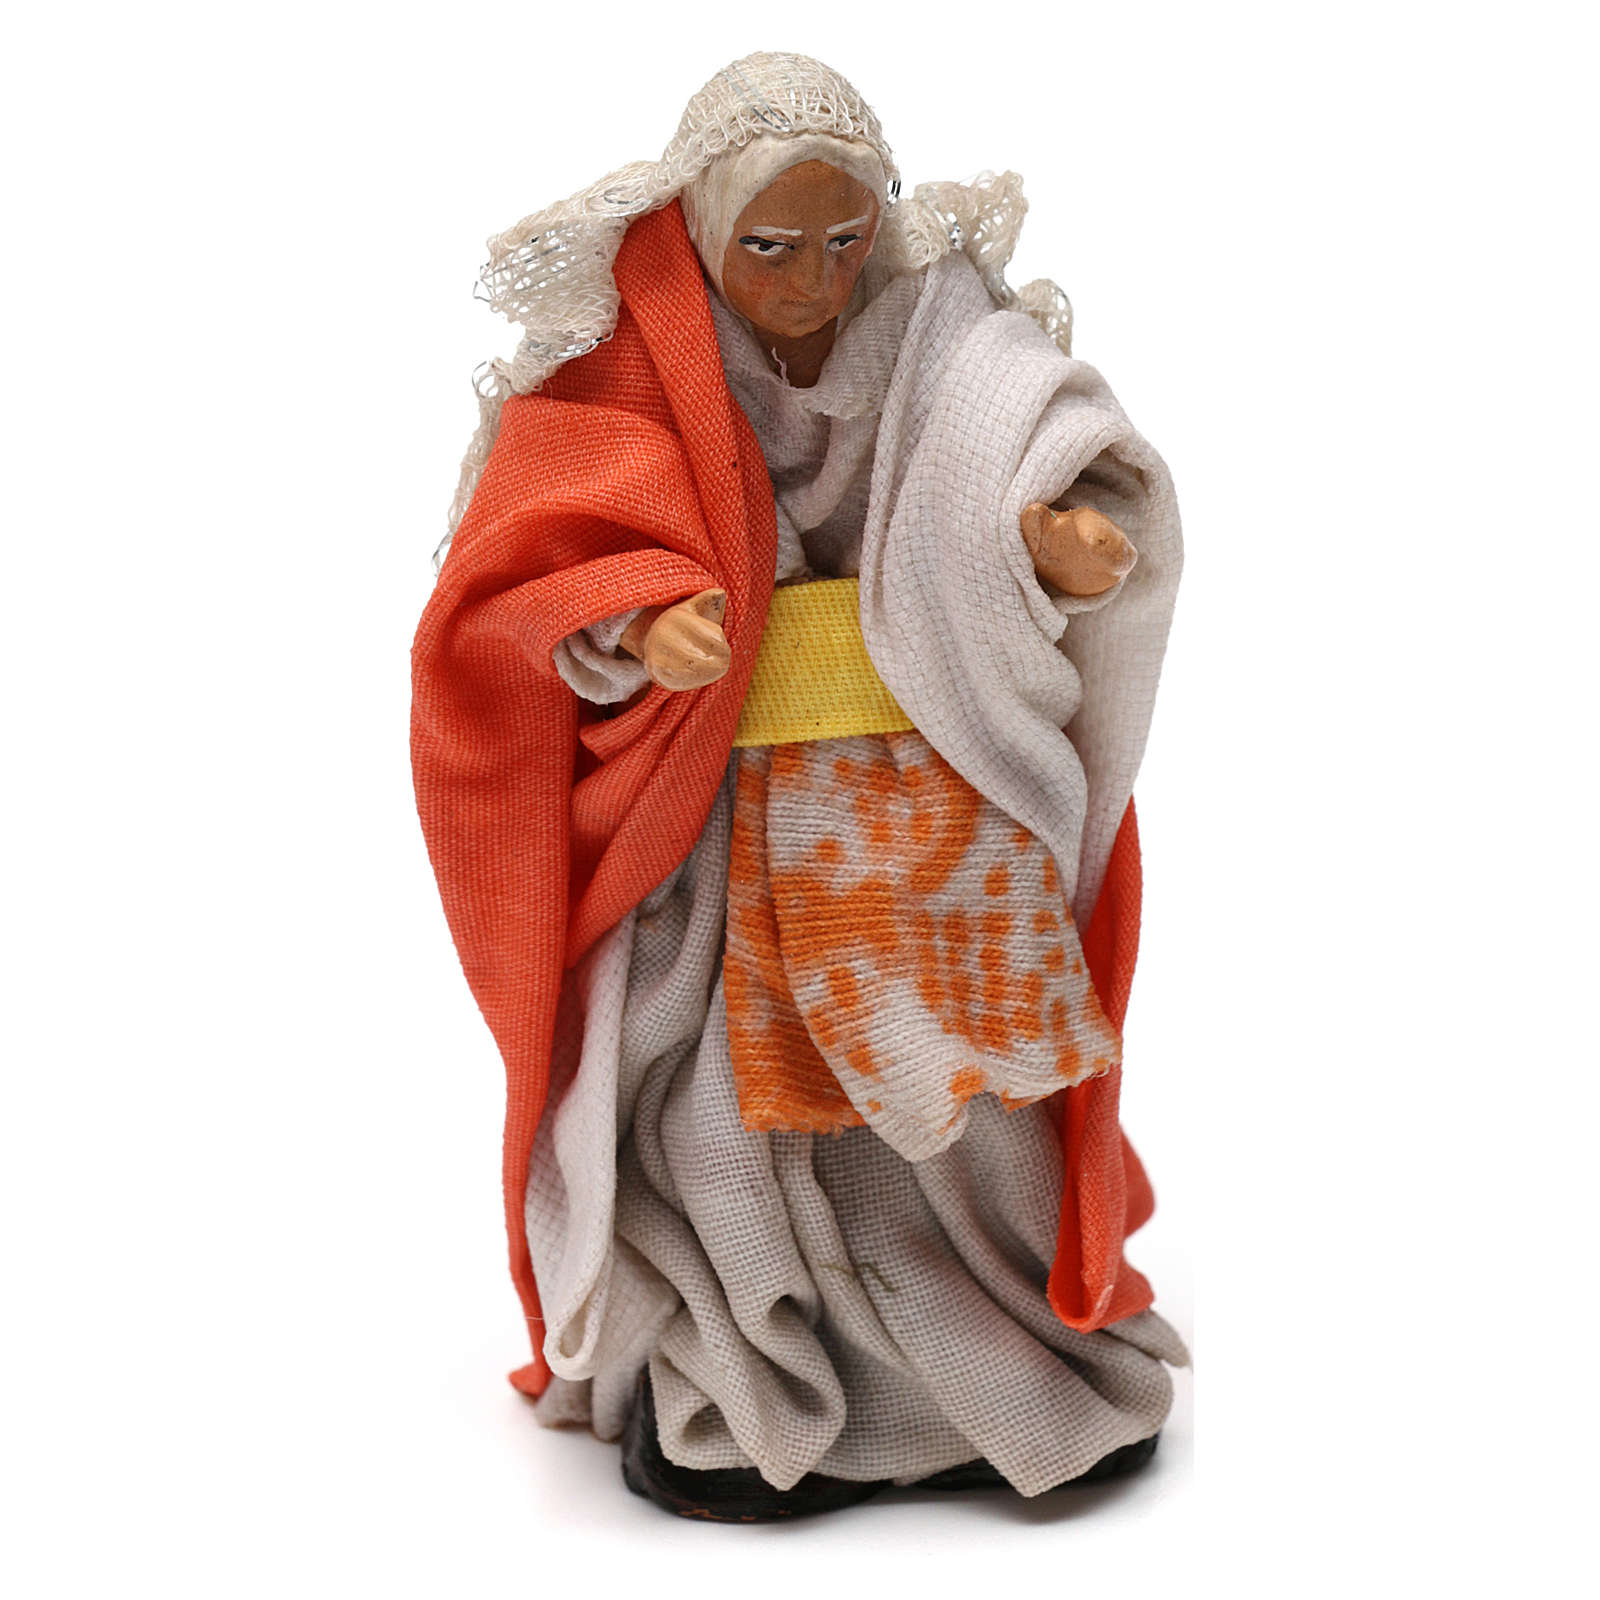 Old woman on balcony Neapolitan Nativity Scene 8 cm 4